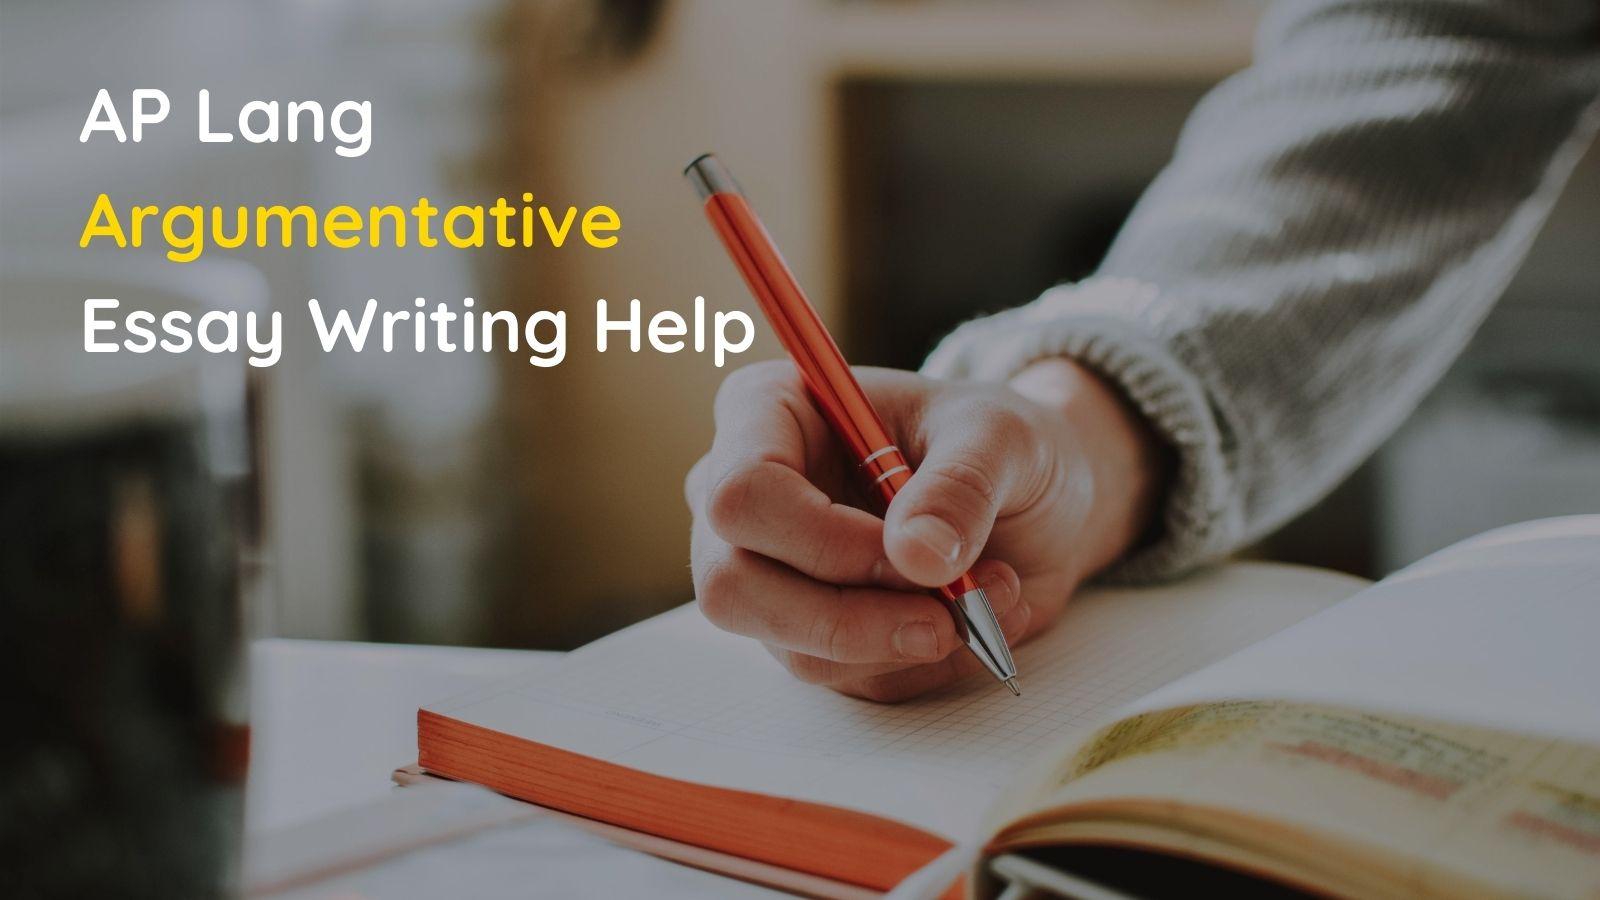 AP Lang Argumentative Essay Help